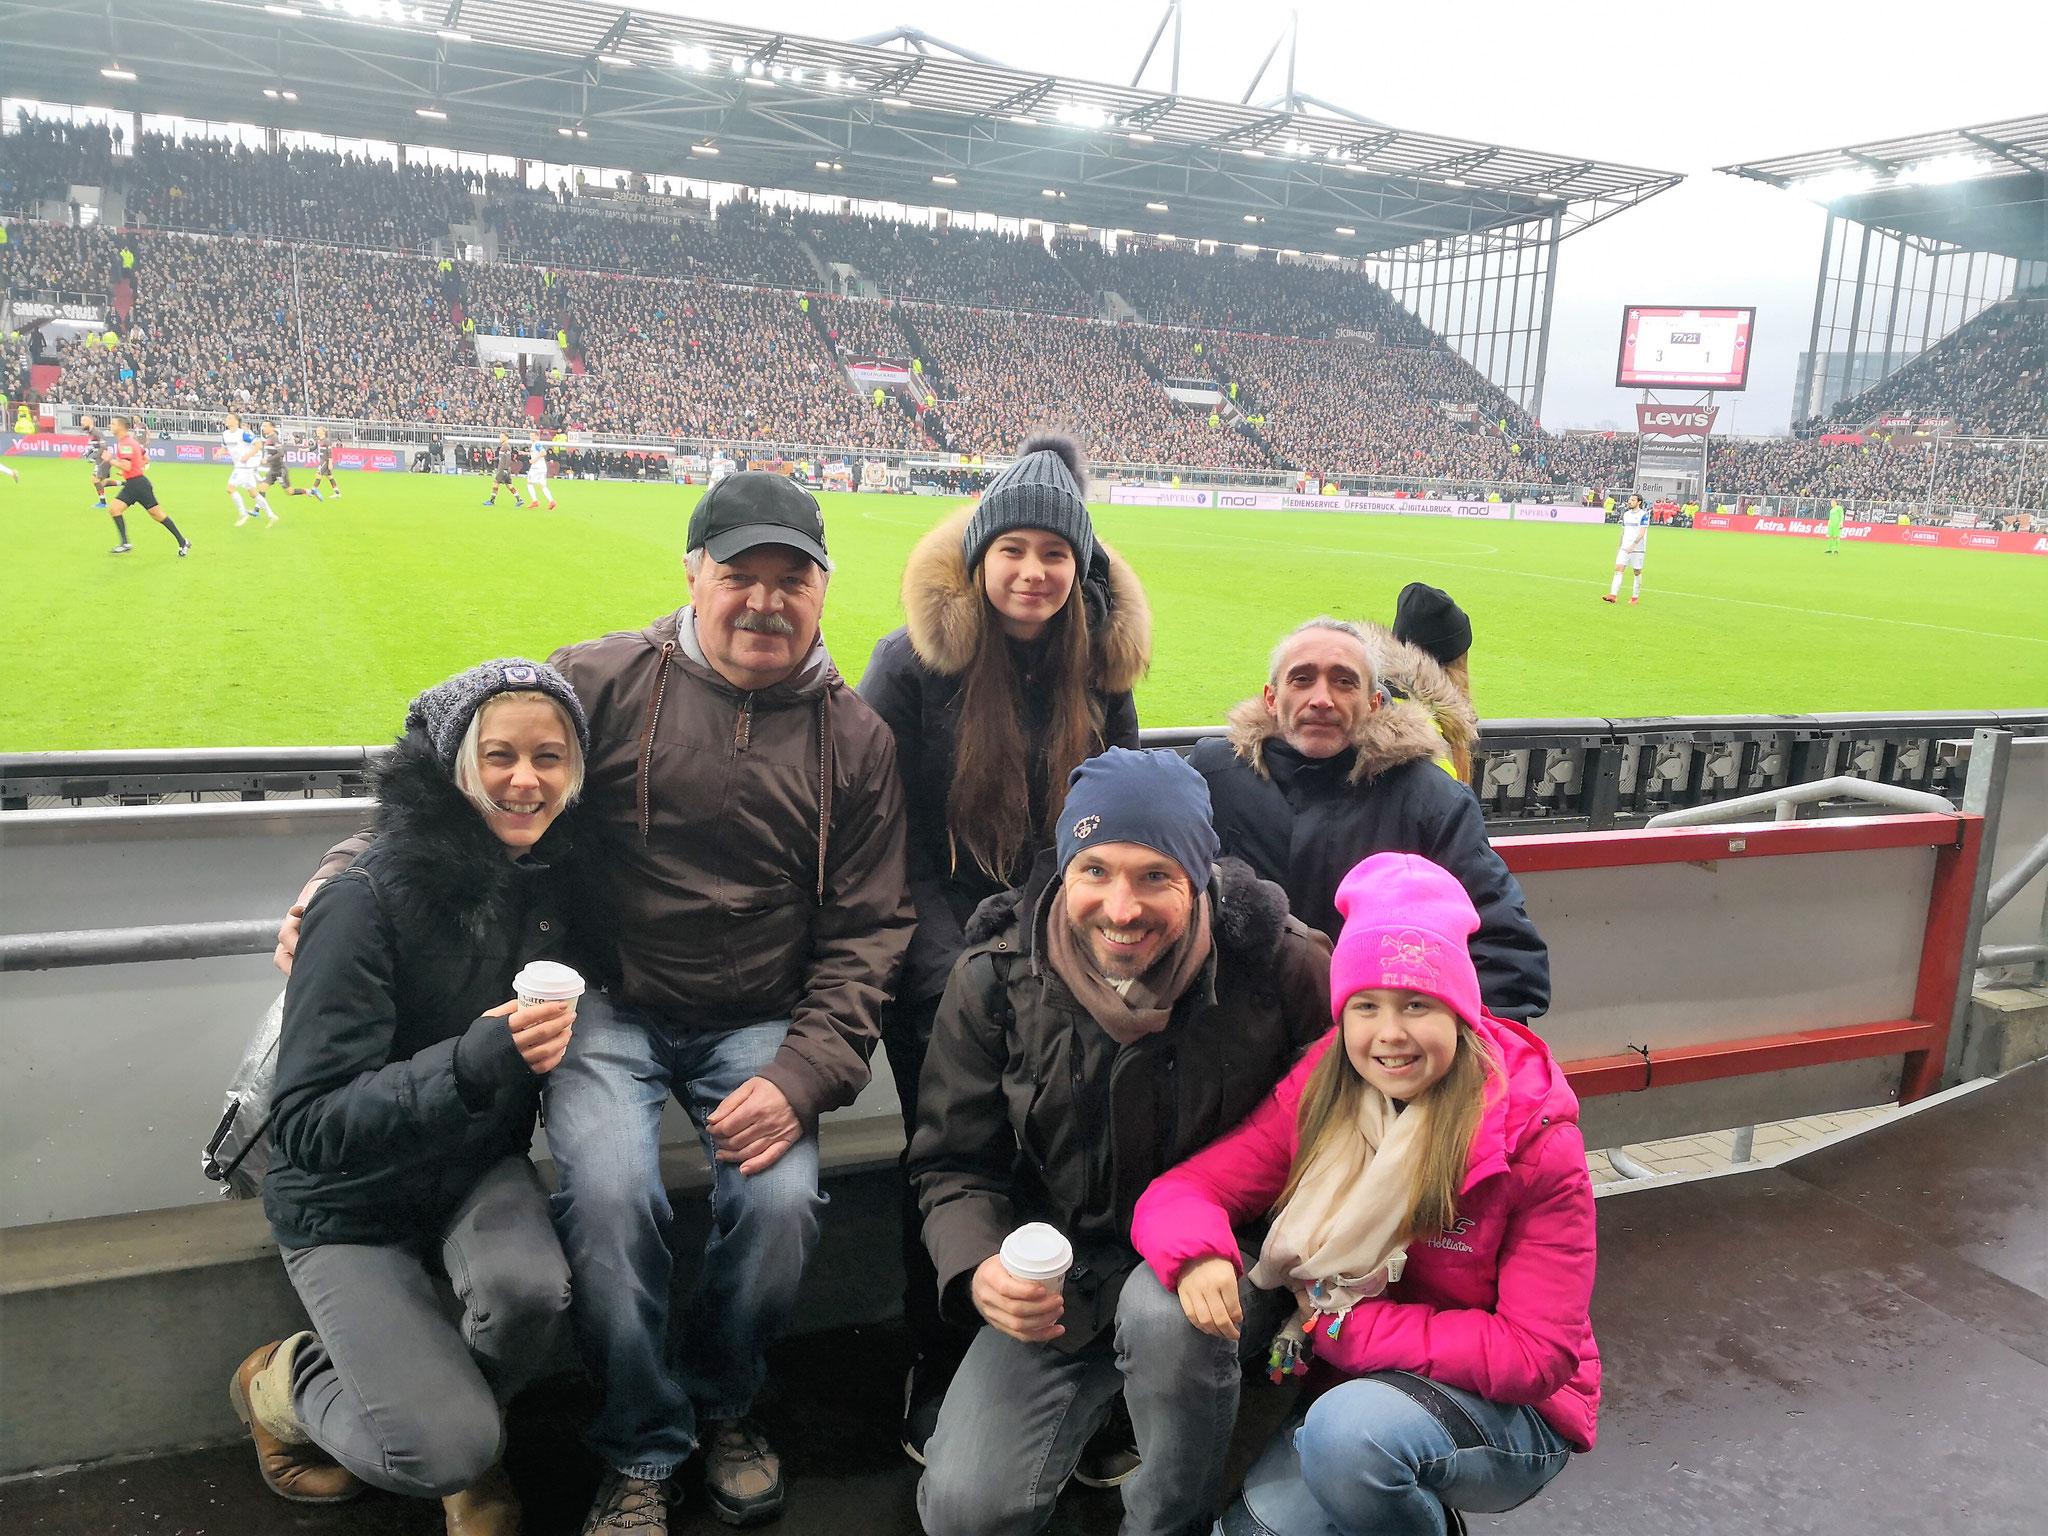 Lebensgefährtin von Axel, Thomas M., Diana, Axel mit Kind und Eduard